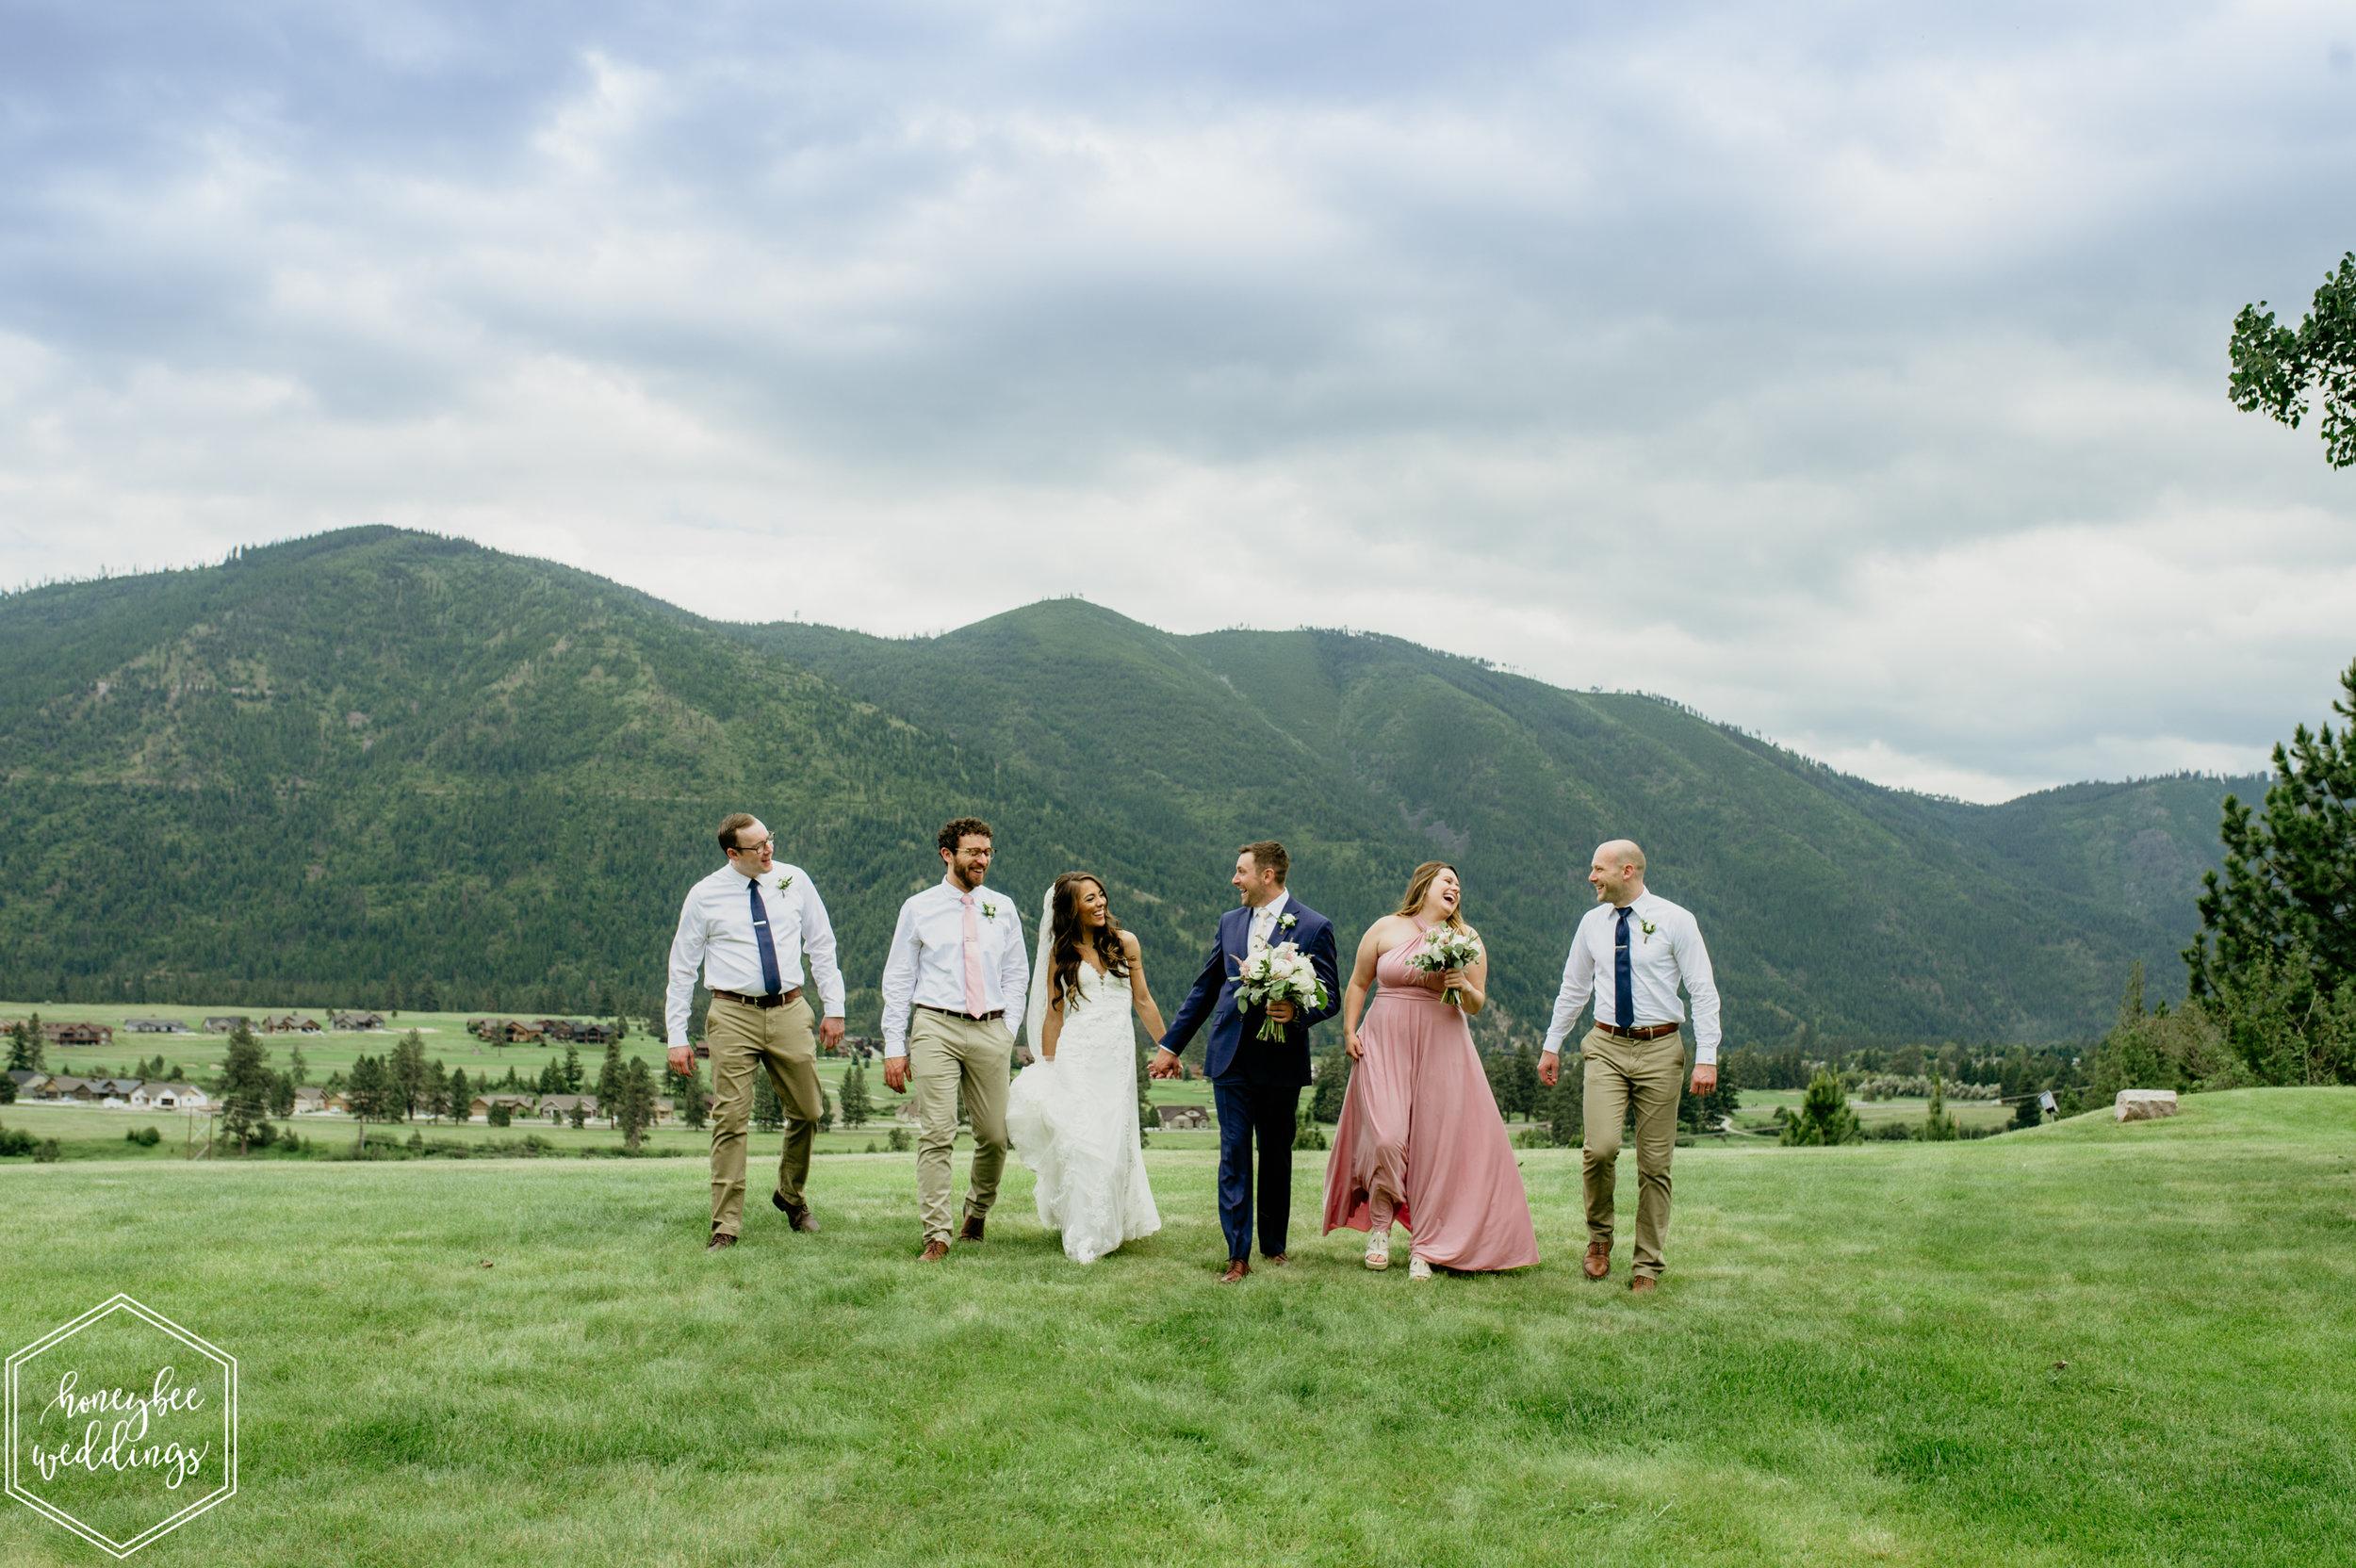 228Montana Wedding Photographer_Missoula Wedding_Honeybee Weddings_Devlin & Jacob_June 22, 2019-2910.jpg